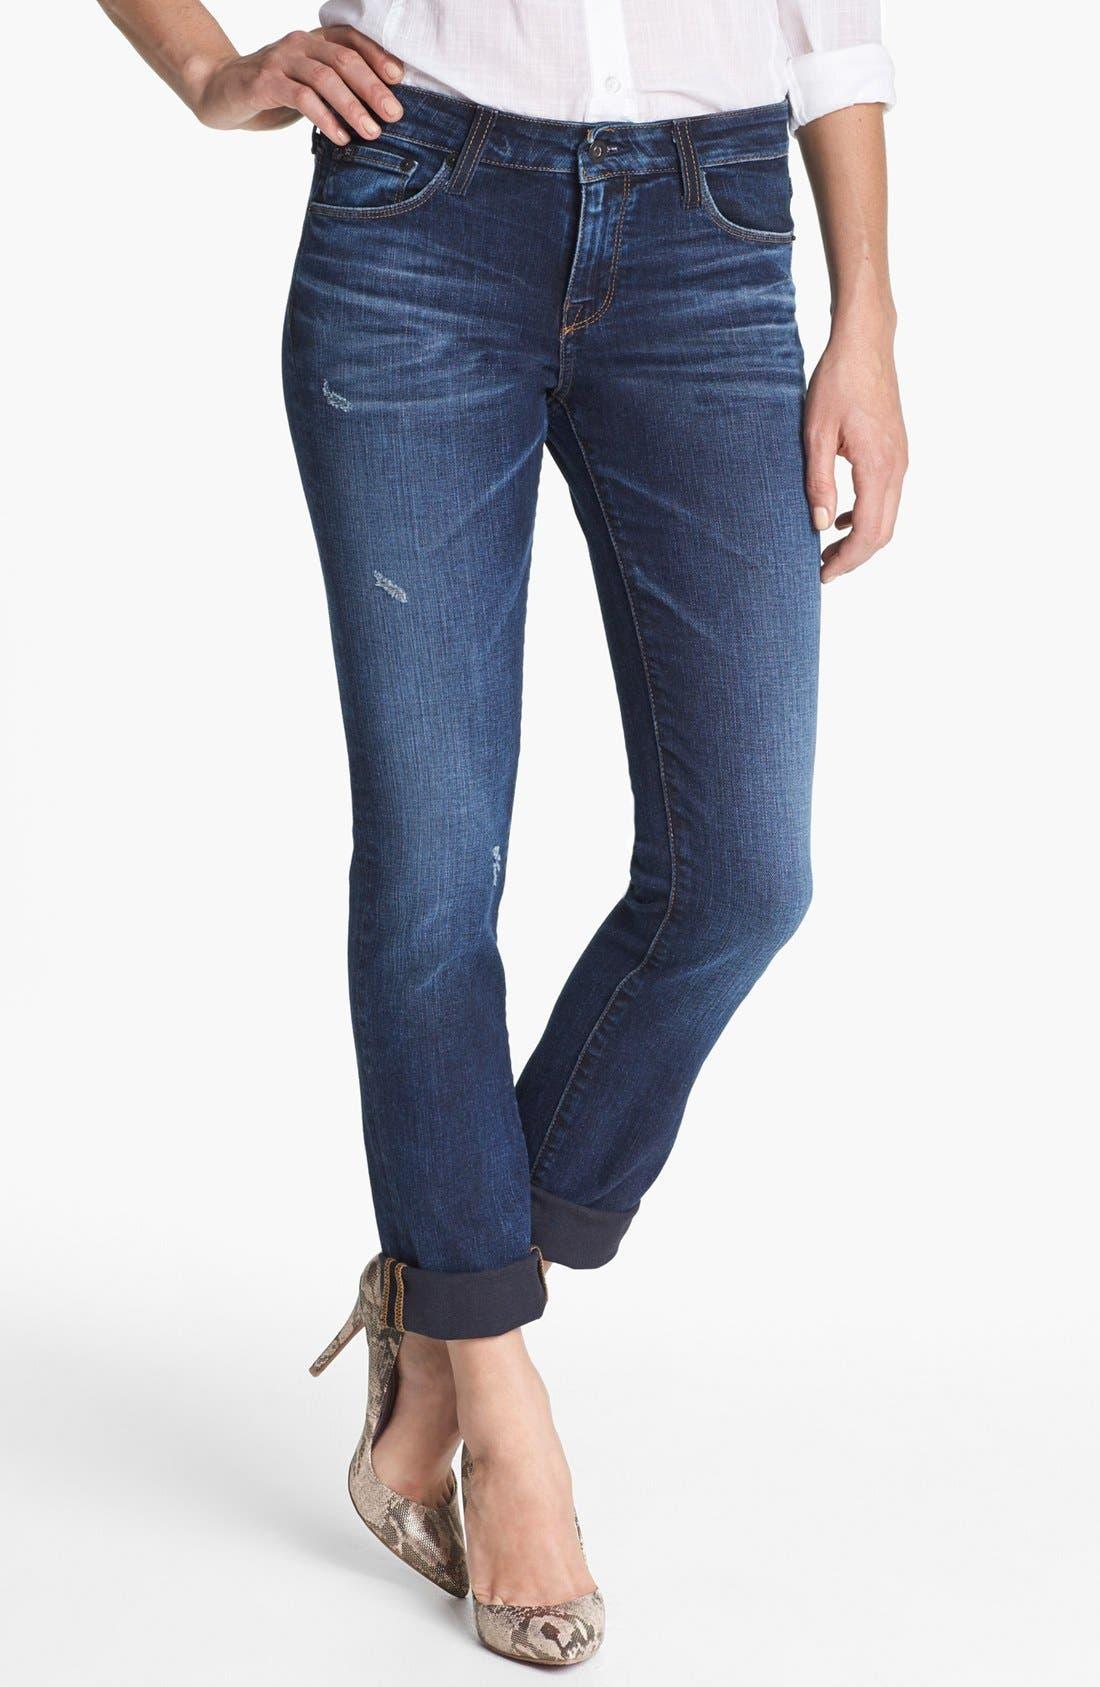 Main Image - Big Star 'Kate' Distressed Straight Leg Jeans (Three Year Malibu) (Petite)